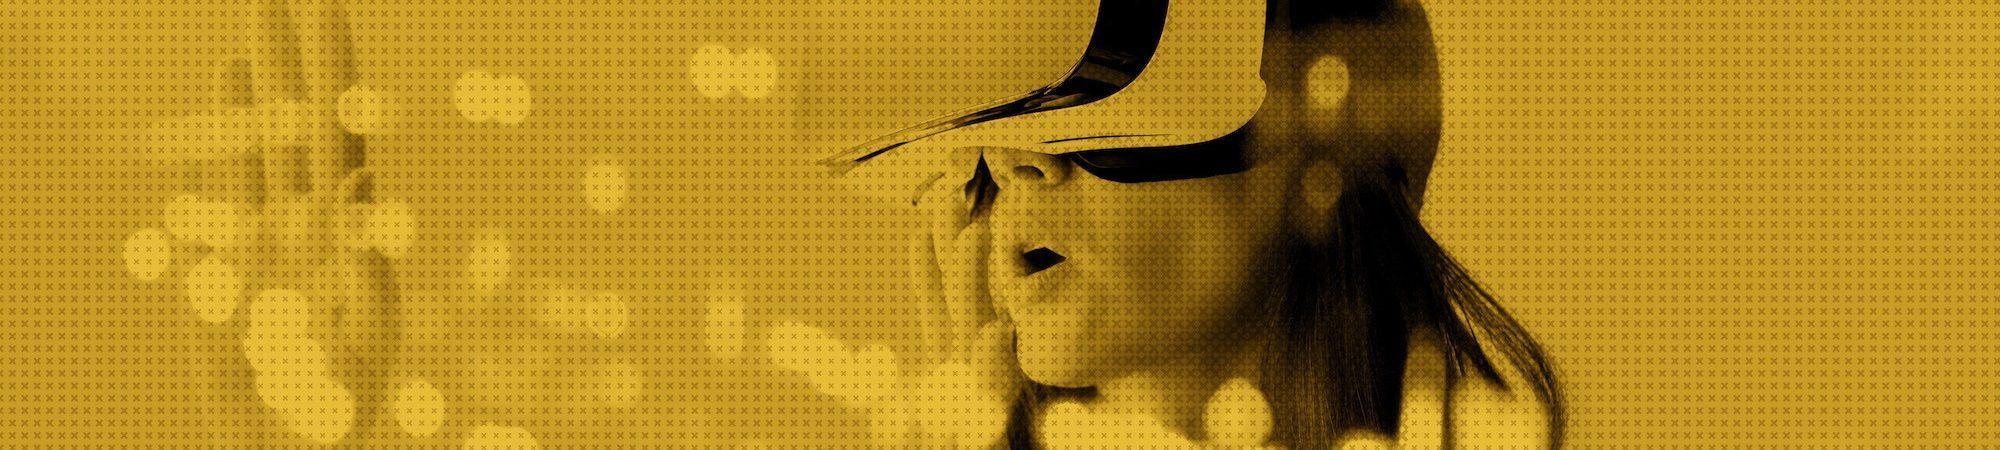 Shutterstock_1060966313_treatment_yellow3